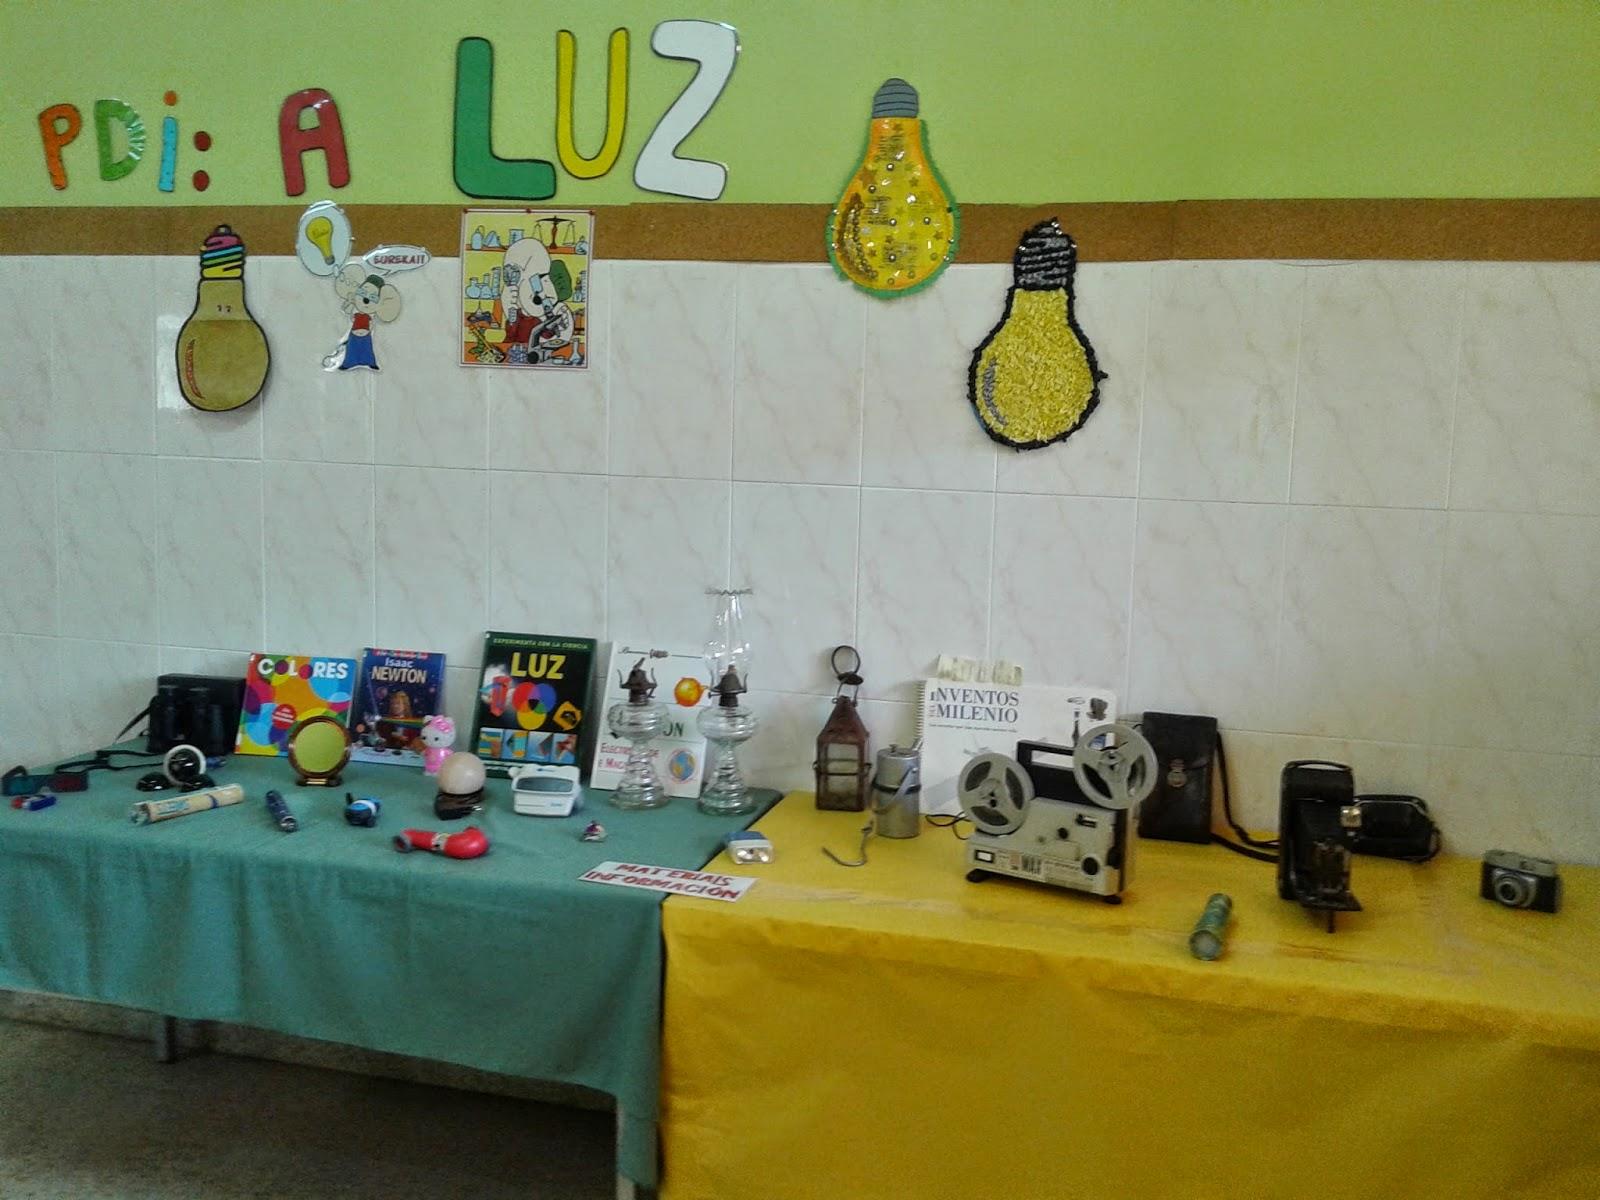 https://picasaweb.google.com/106492642830674207813/LUZECOR